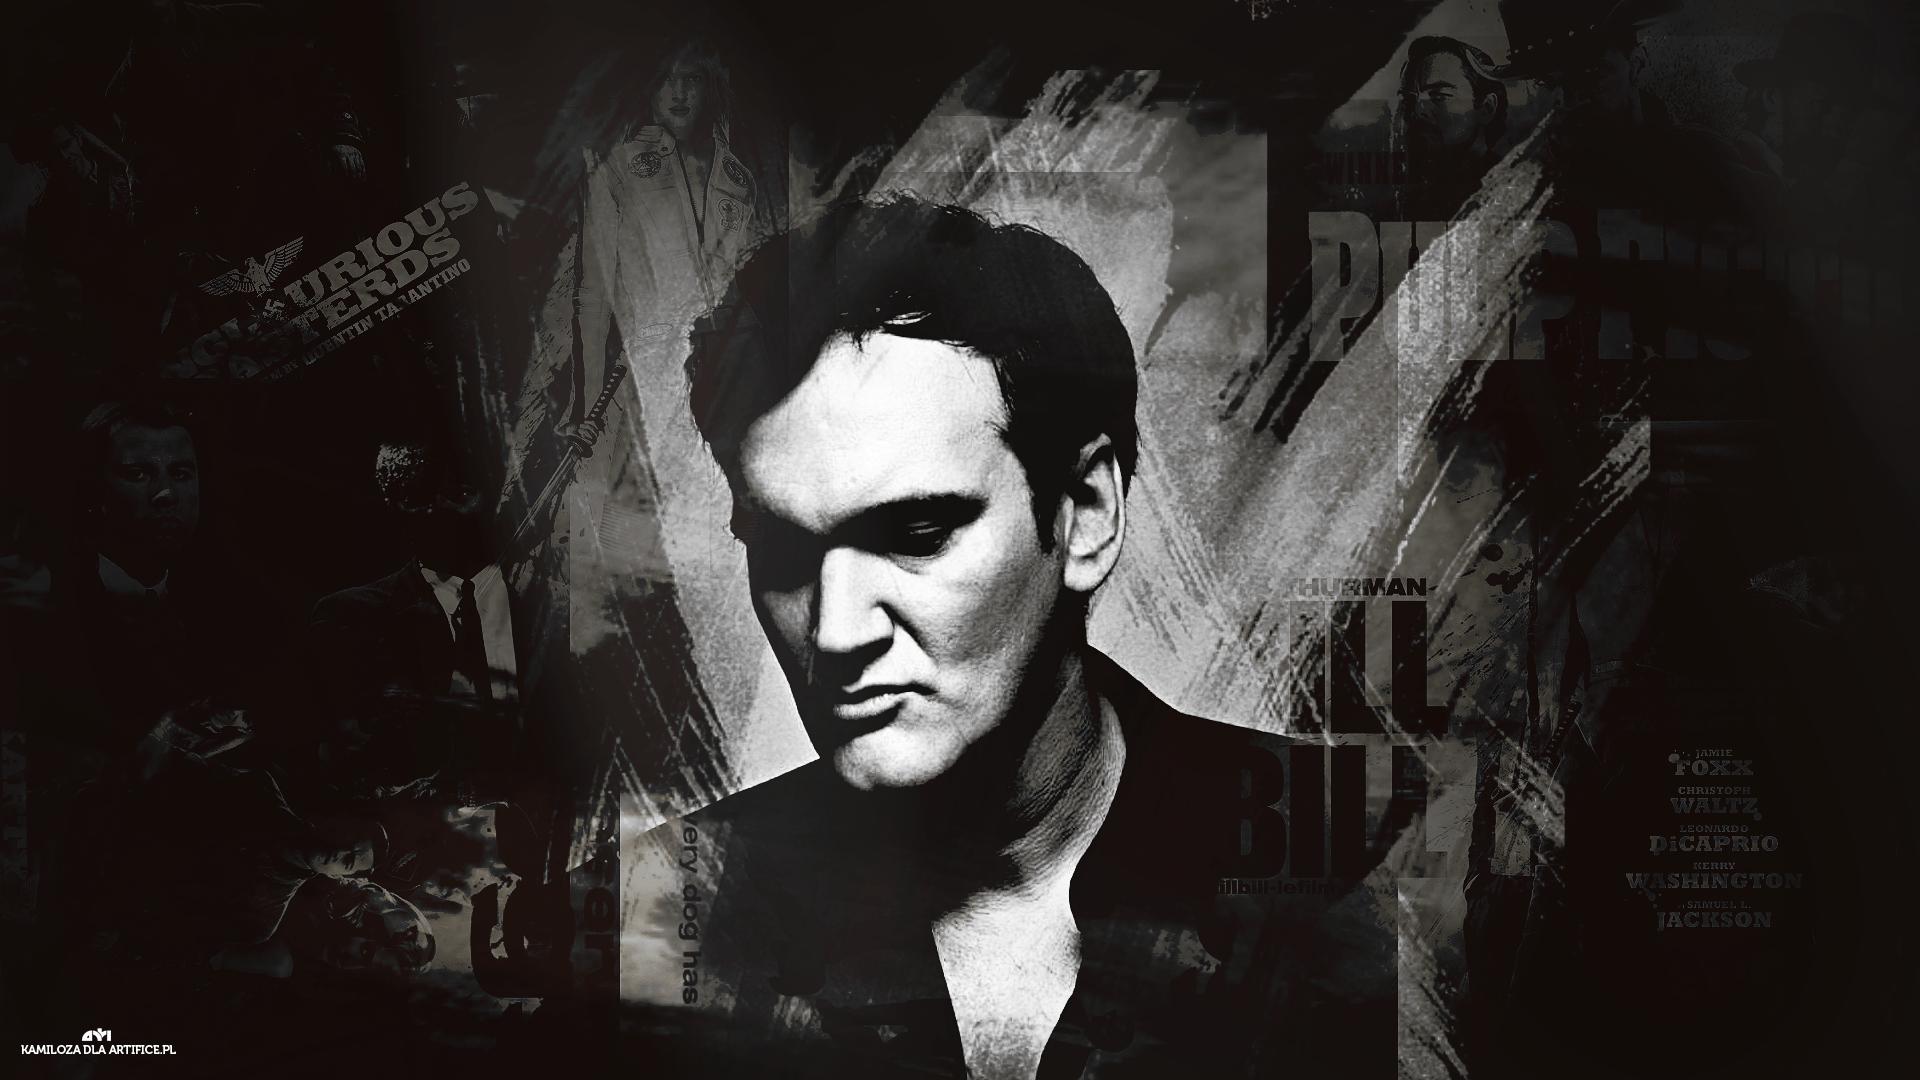 Quentin Tarantino con el ojo al lente